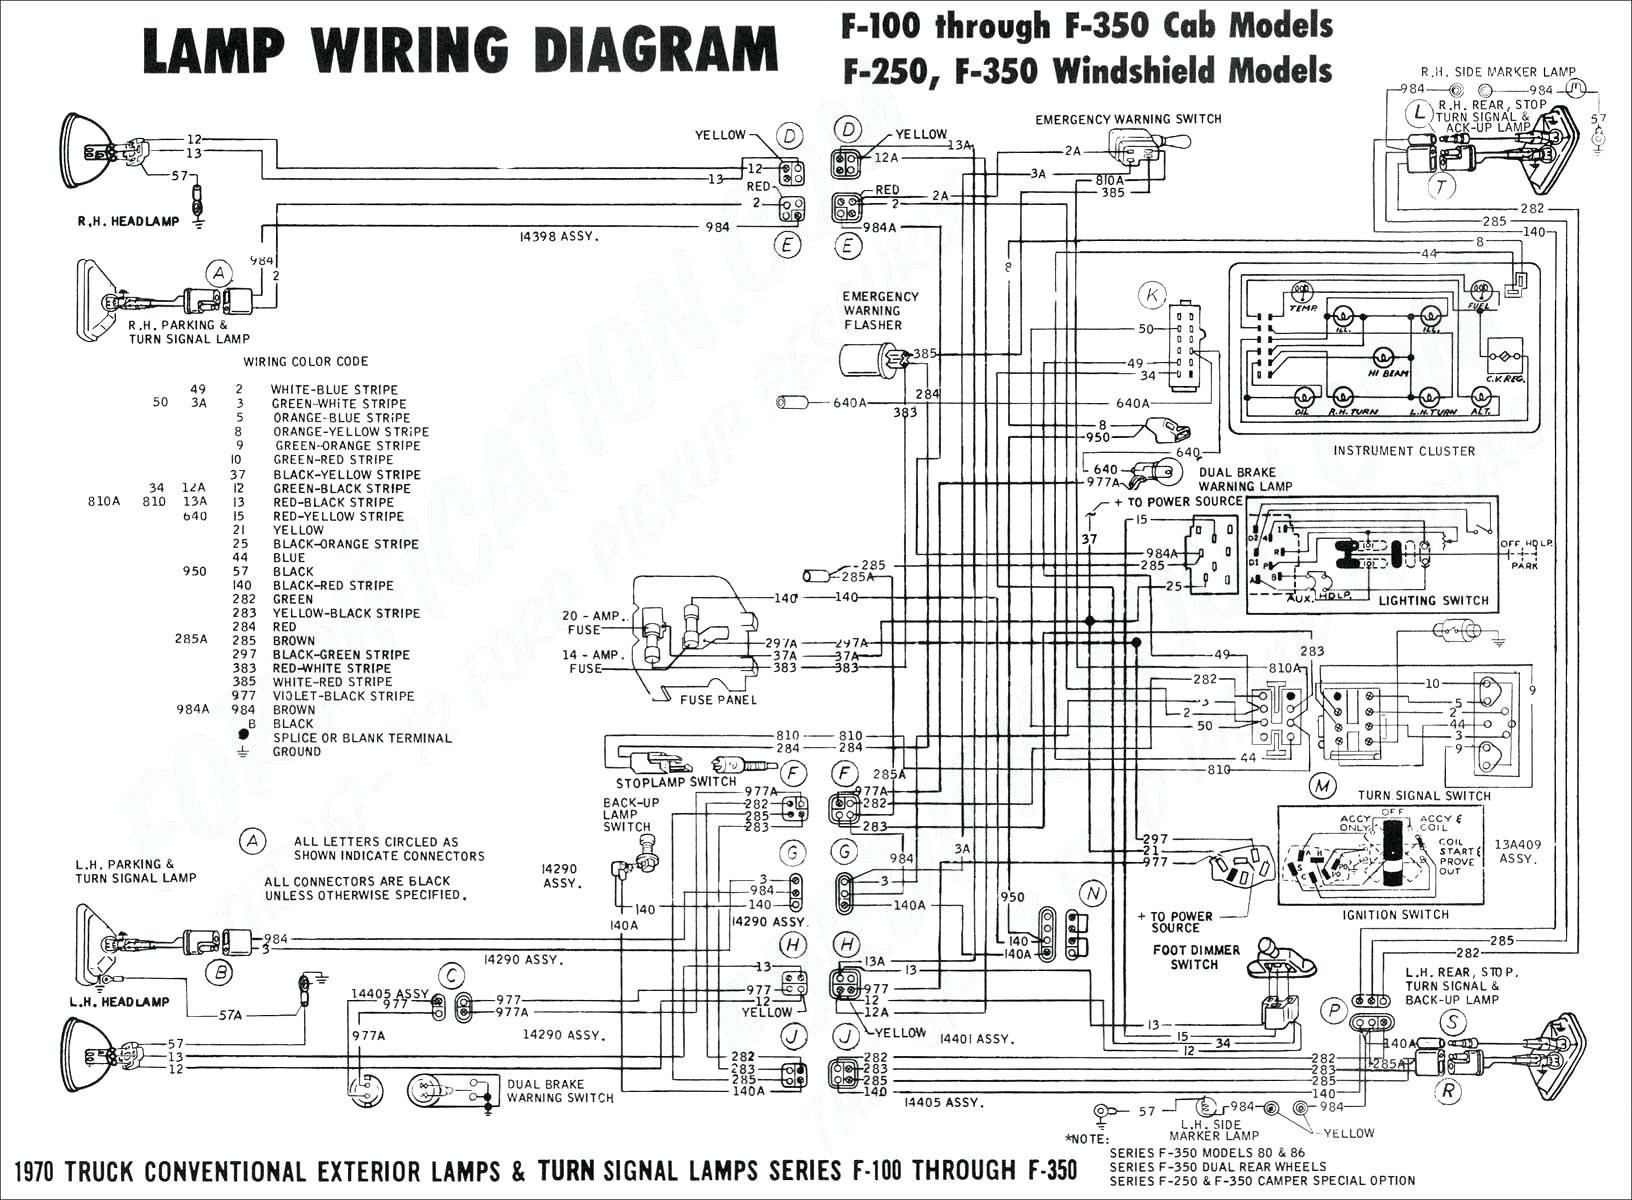 Atv Winch Wiring Diagram 1985 Dodge Pickup Wiring Diagram Of Atv Winch Wiring Diagram